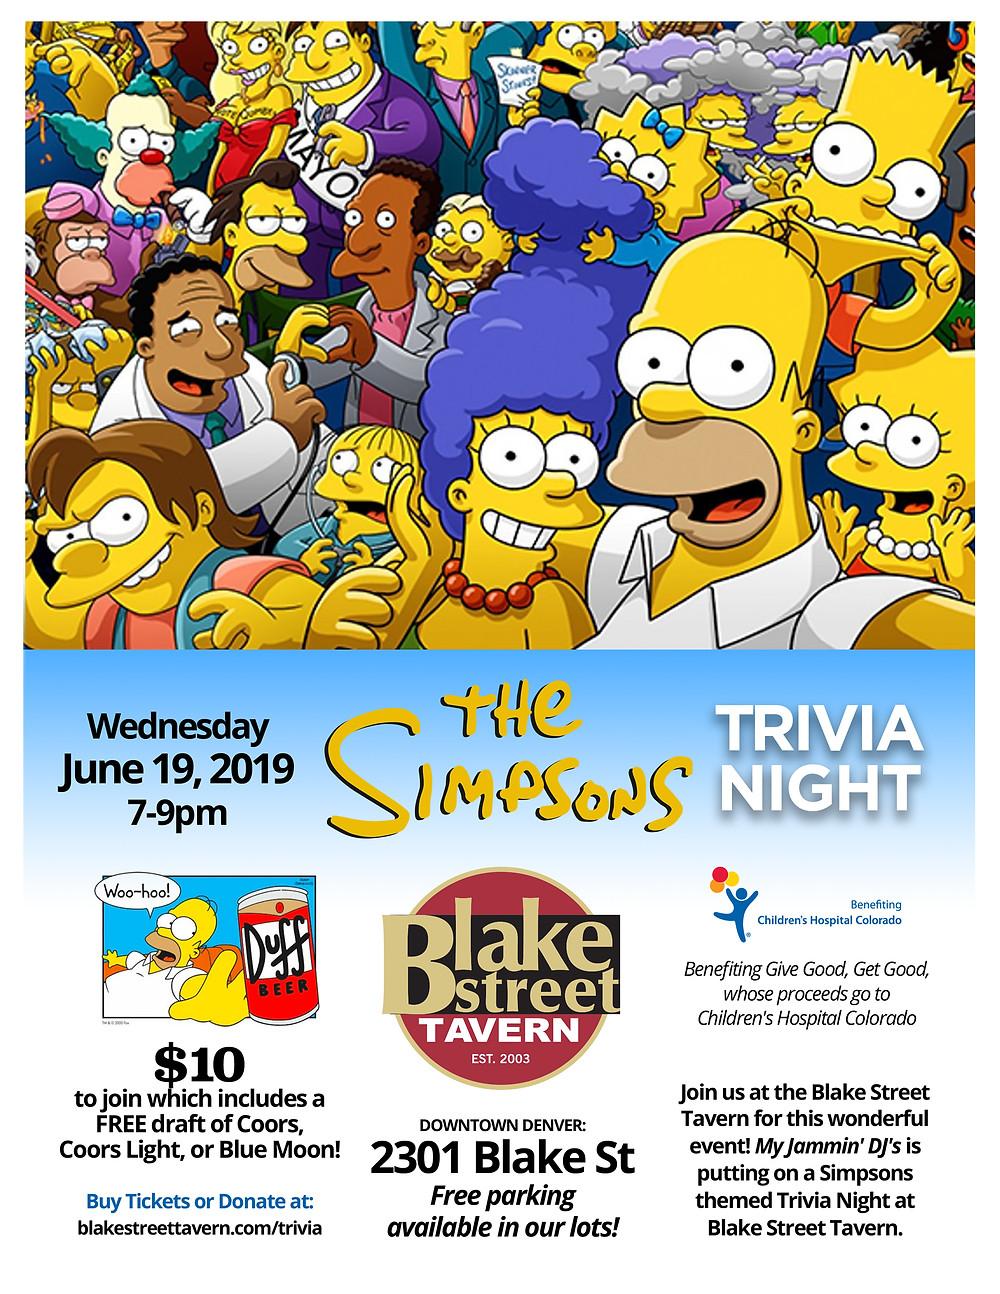 Denver Trivia: The Simpsons